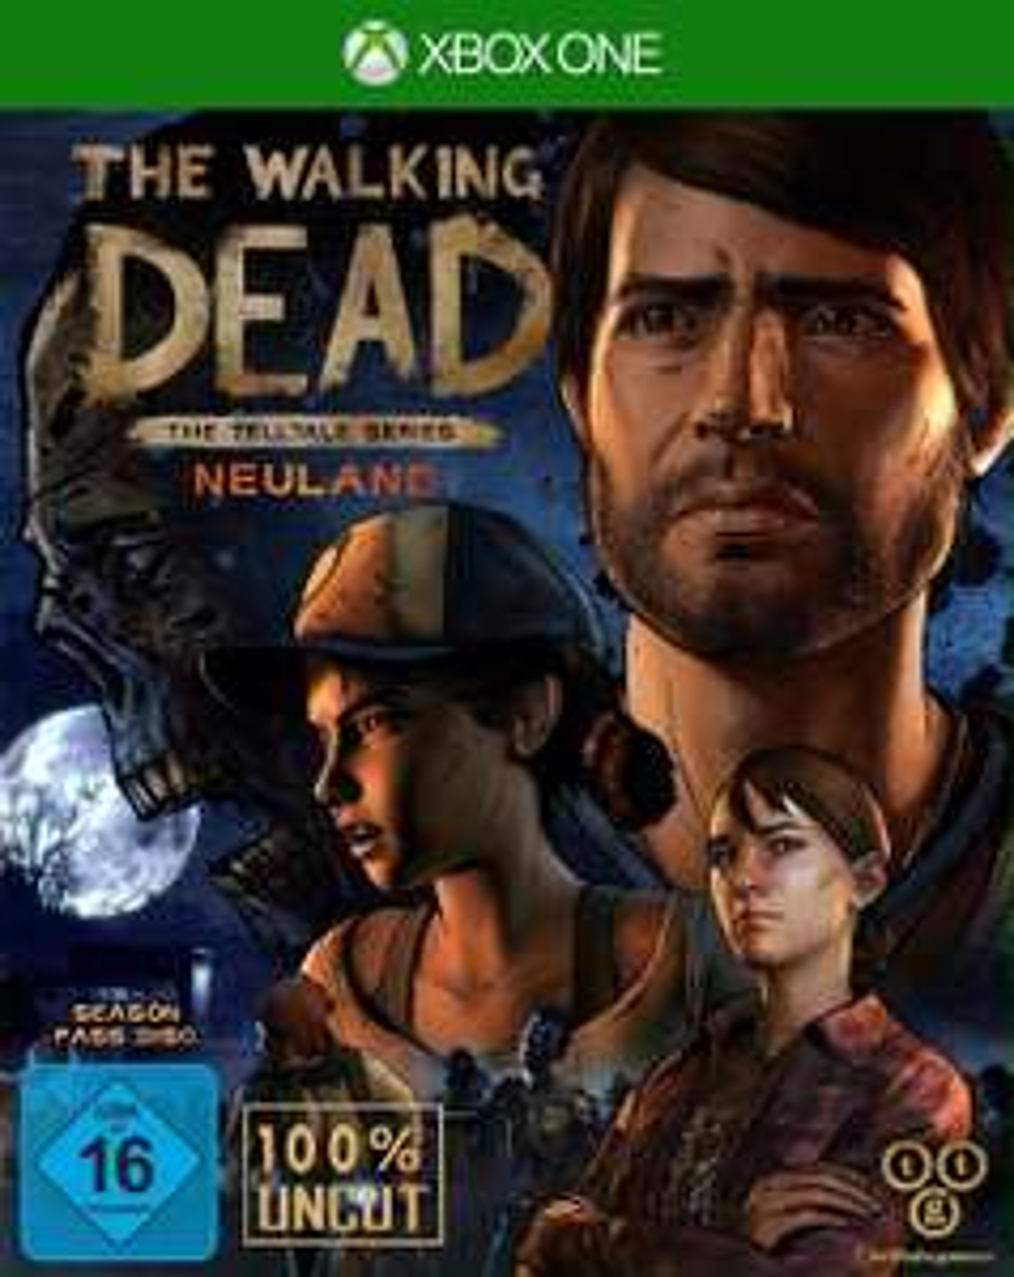 The Walking Dead: The Telltale Games Series - Neuland (Xbox One) für 10€ (Müller)